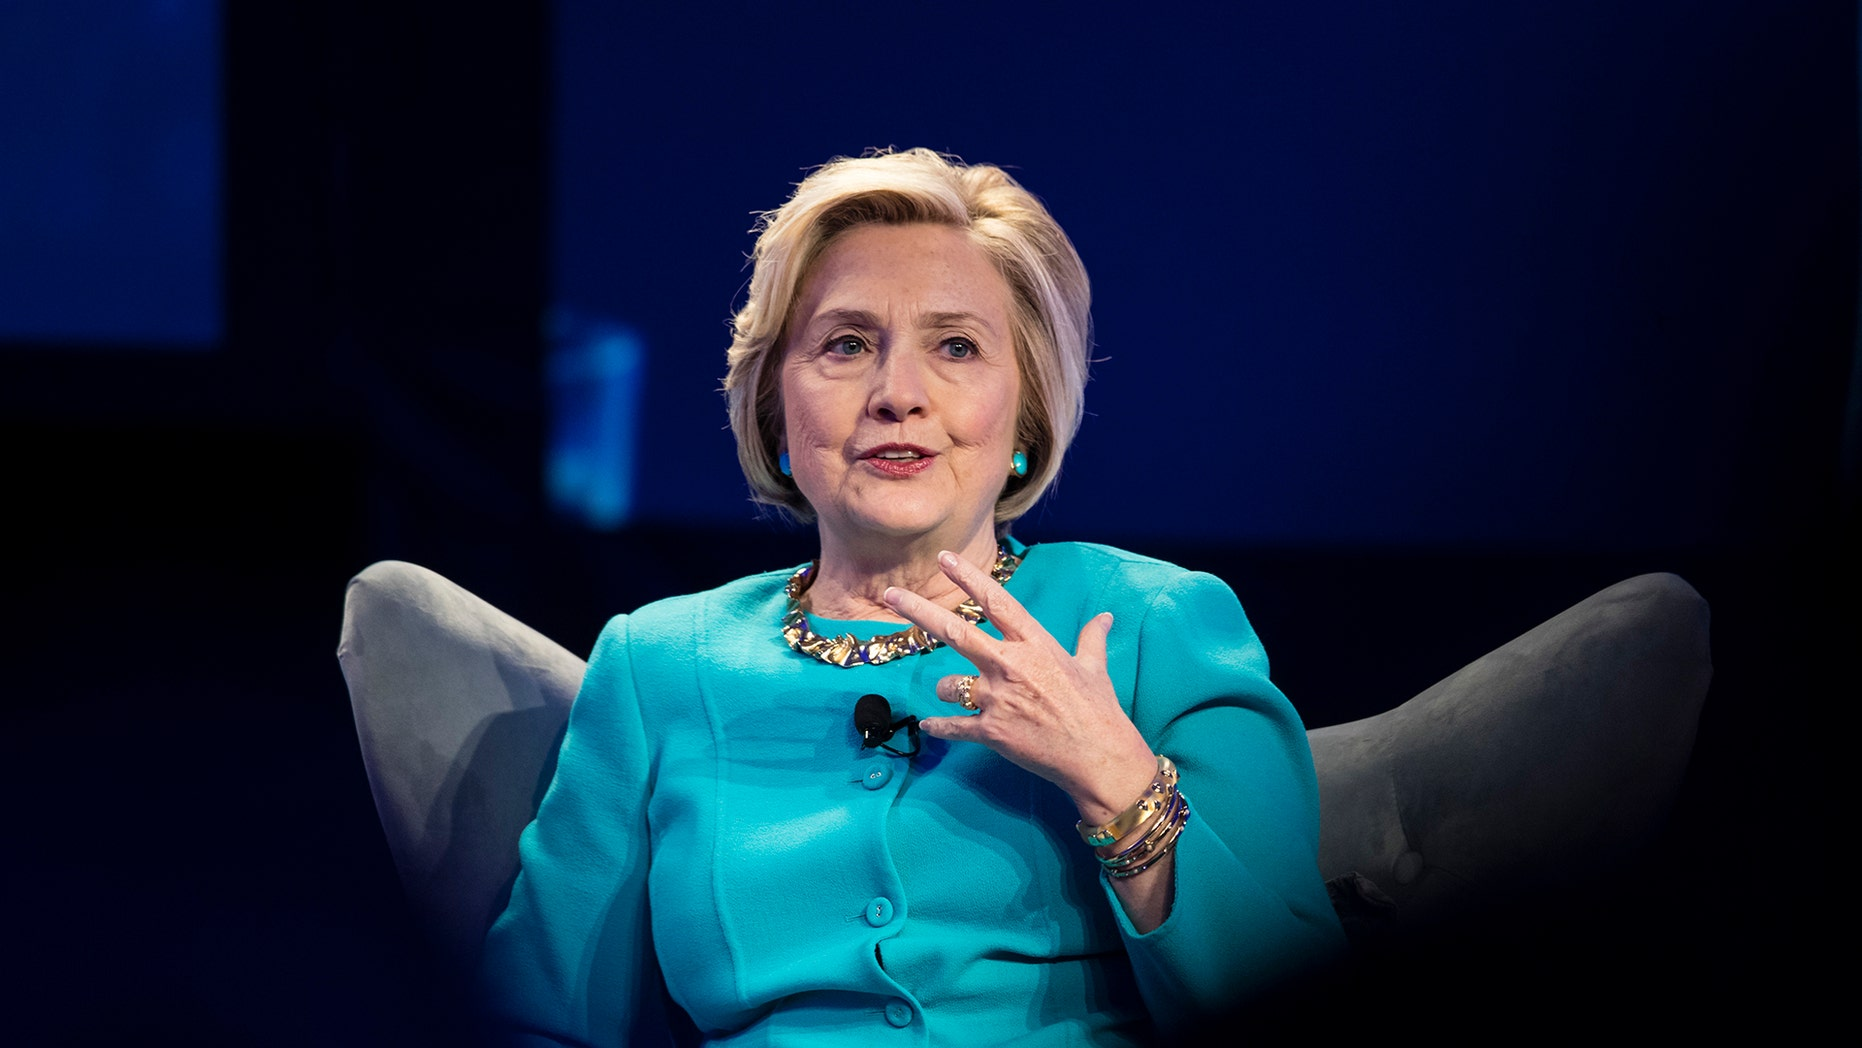 Hillary Clinton at the Geisinger's National Healthcare Symposium in Danville, Pa., Thursday, Nov. 9, 2017. (AP Photo/Matt Rourke)